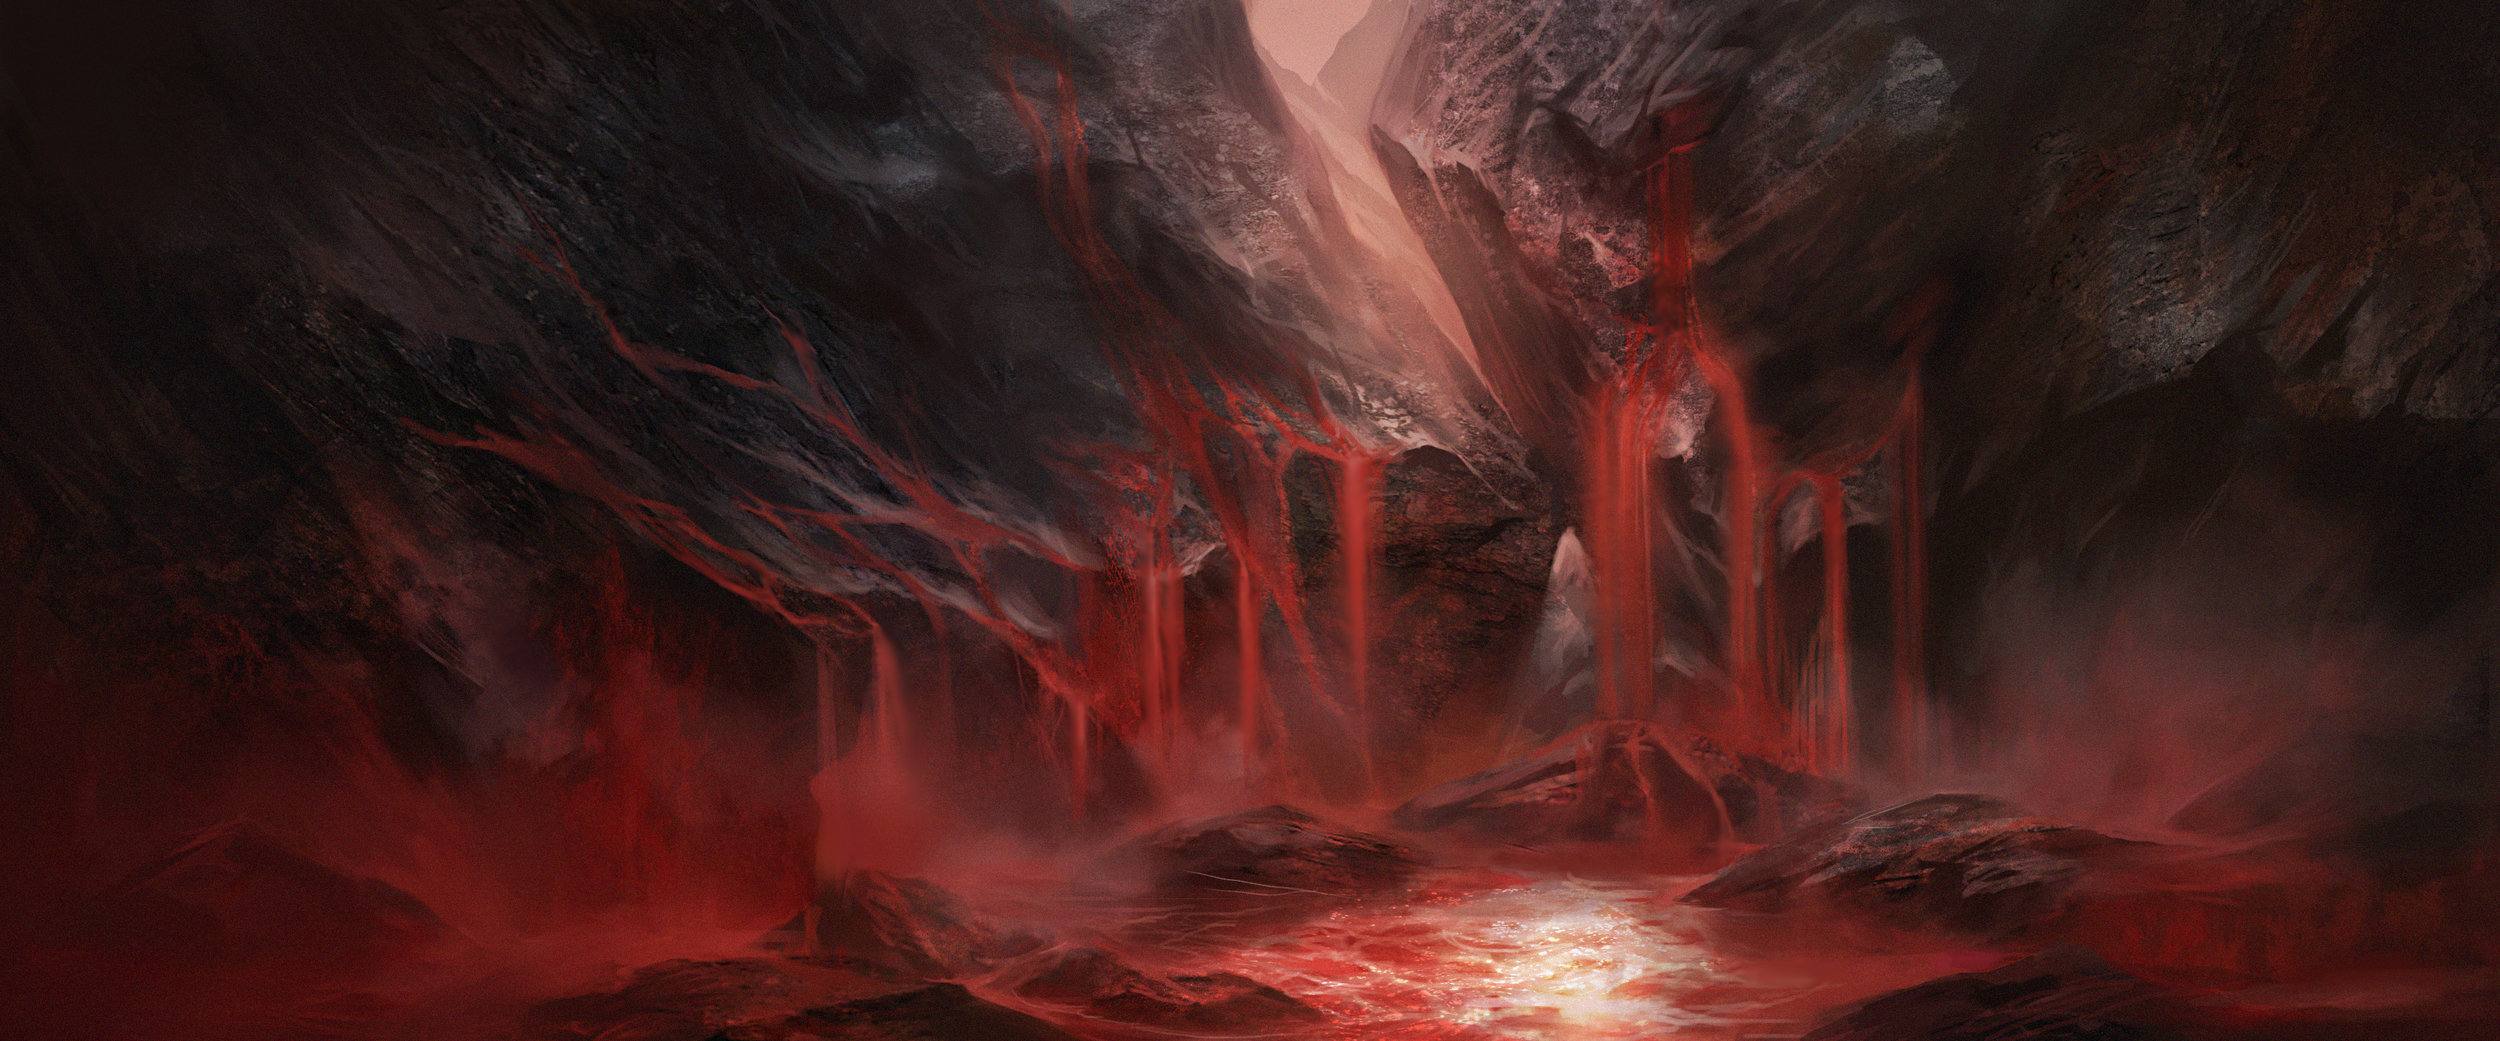 River of Blood_polish2.jpg